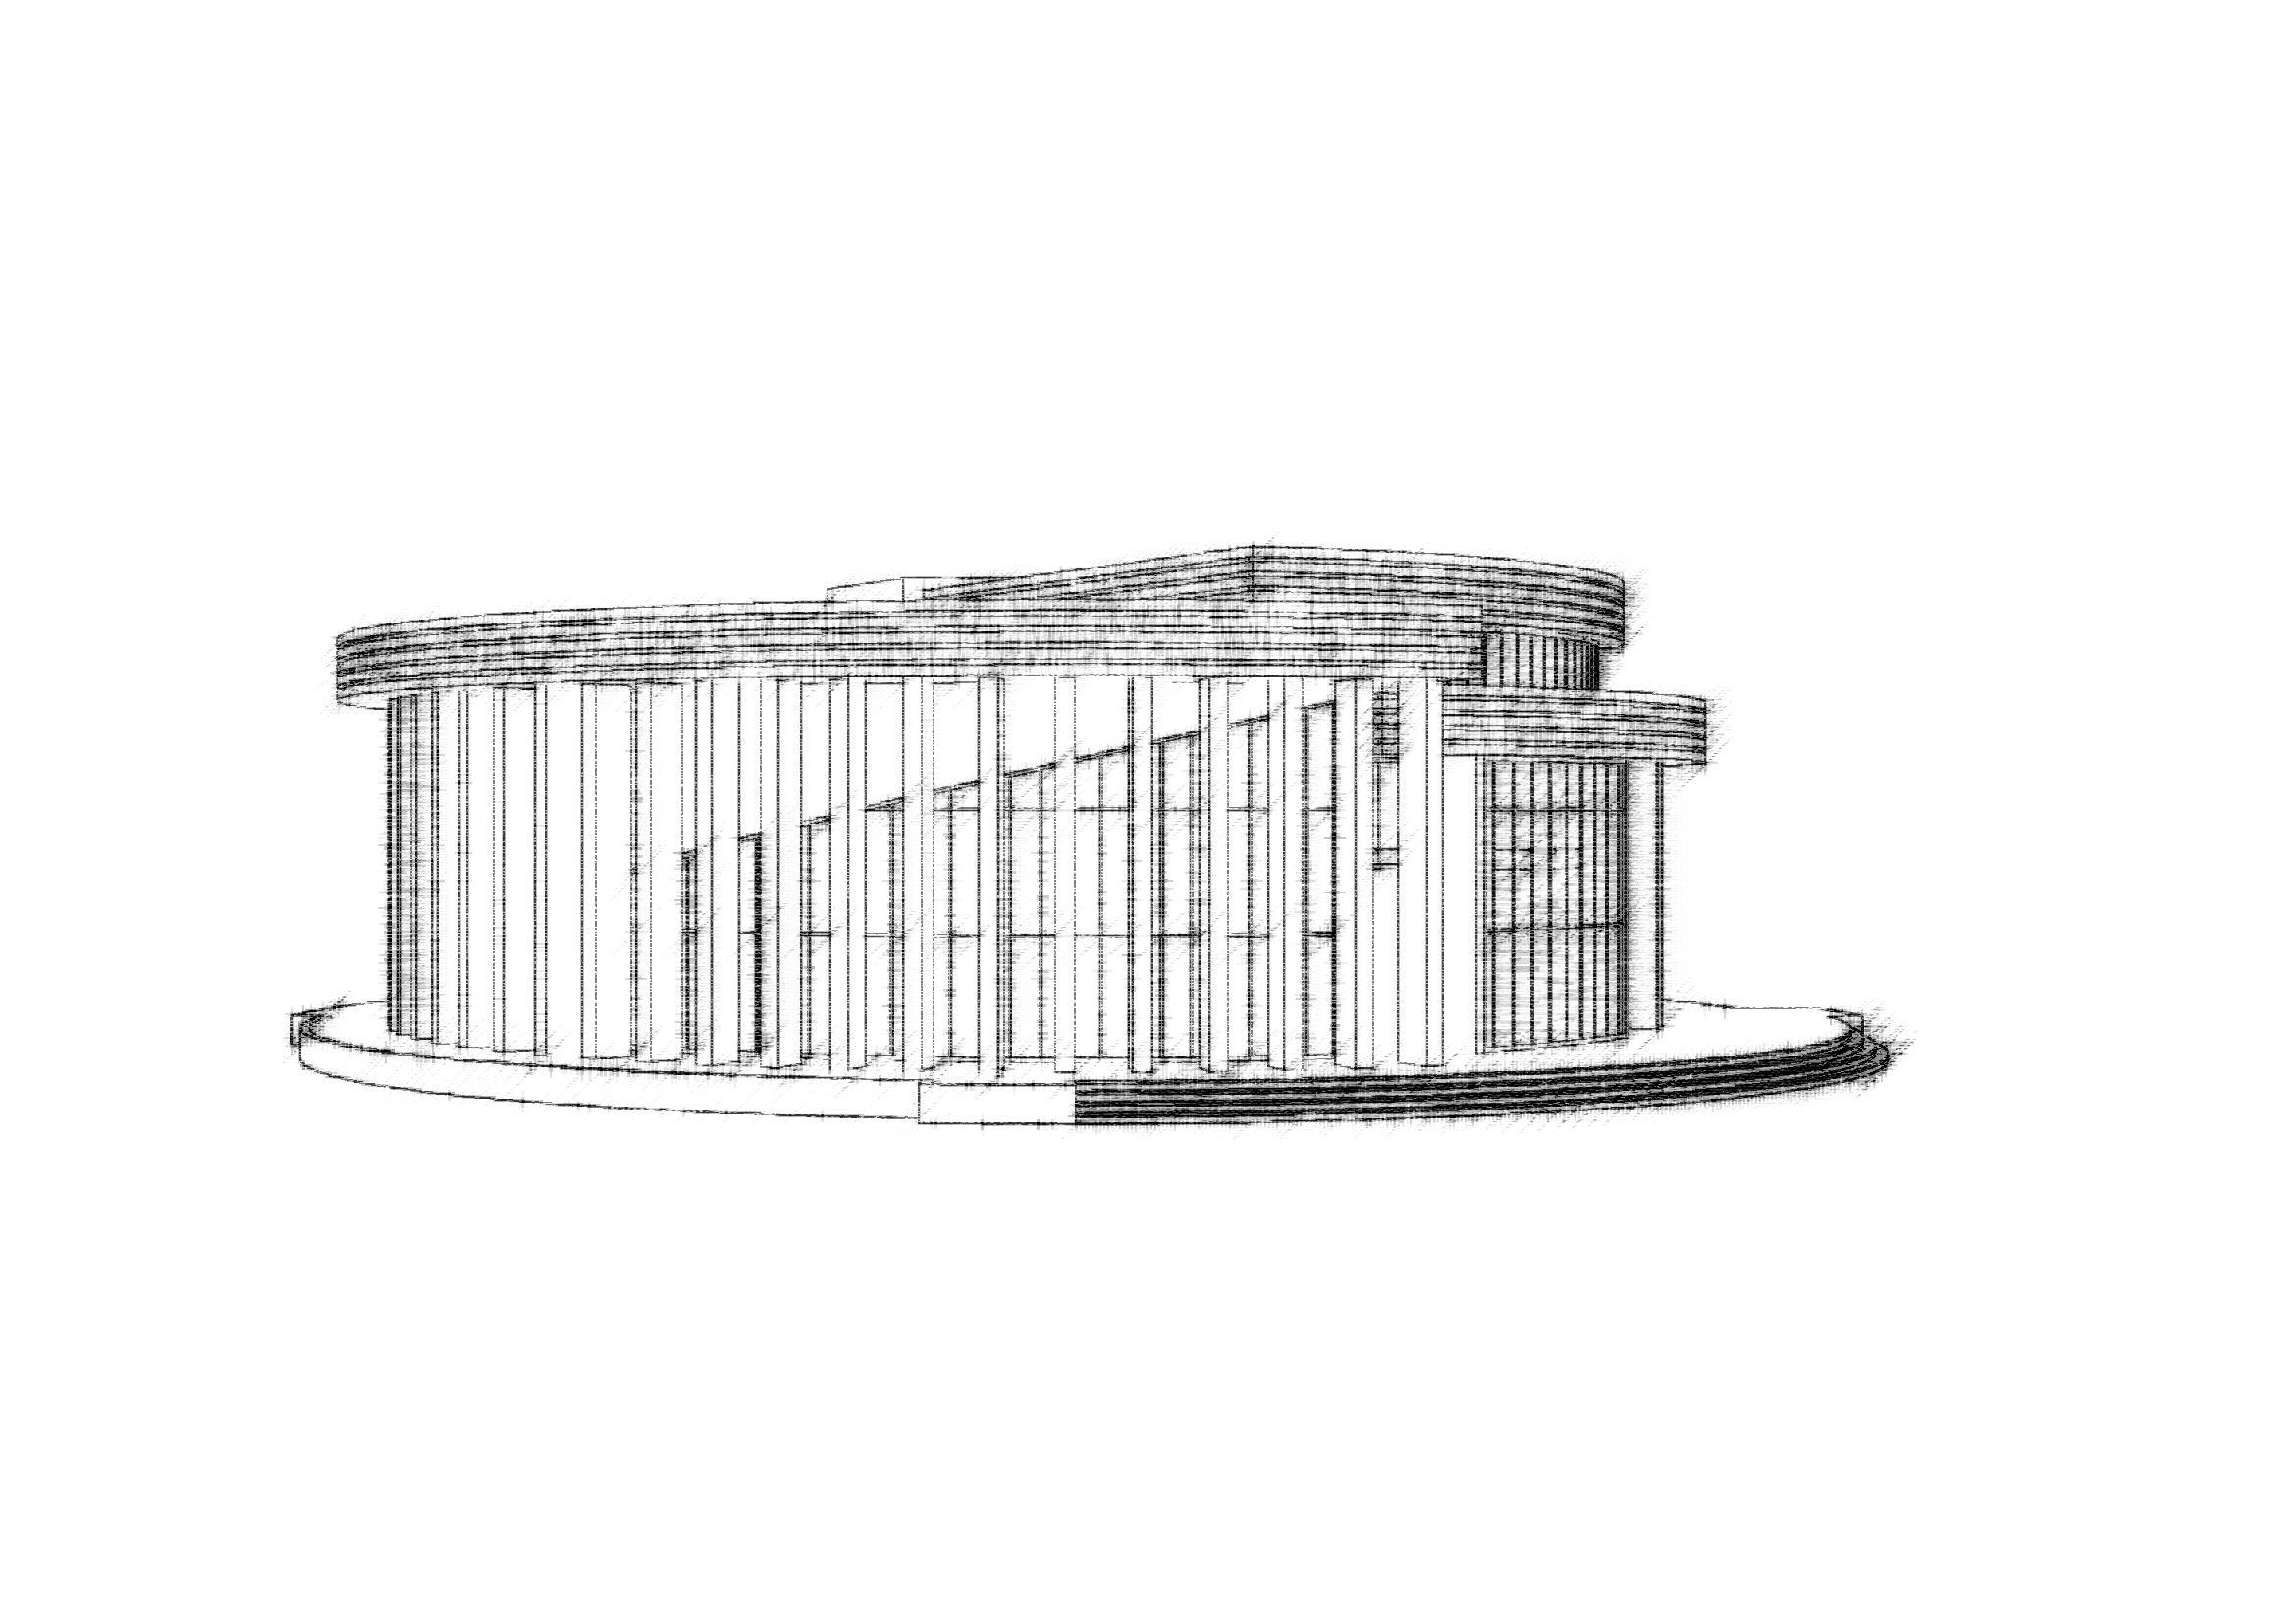 Разработка архитектурной концепции театра оперы и балета фото f_08752f3722409305.jpg